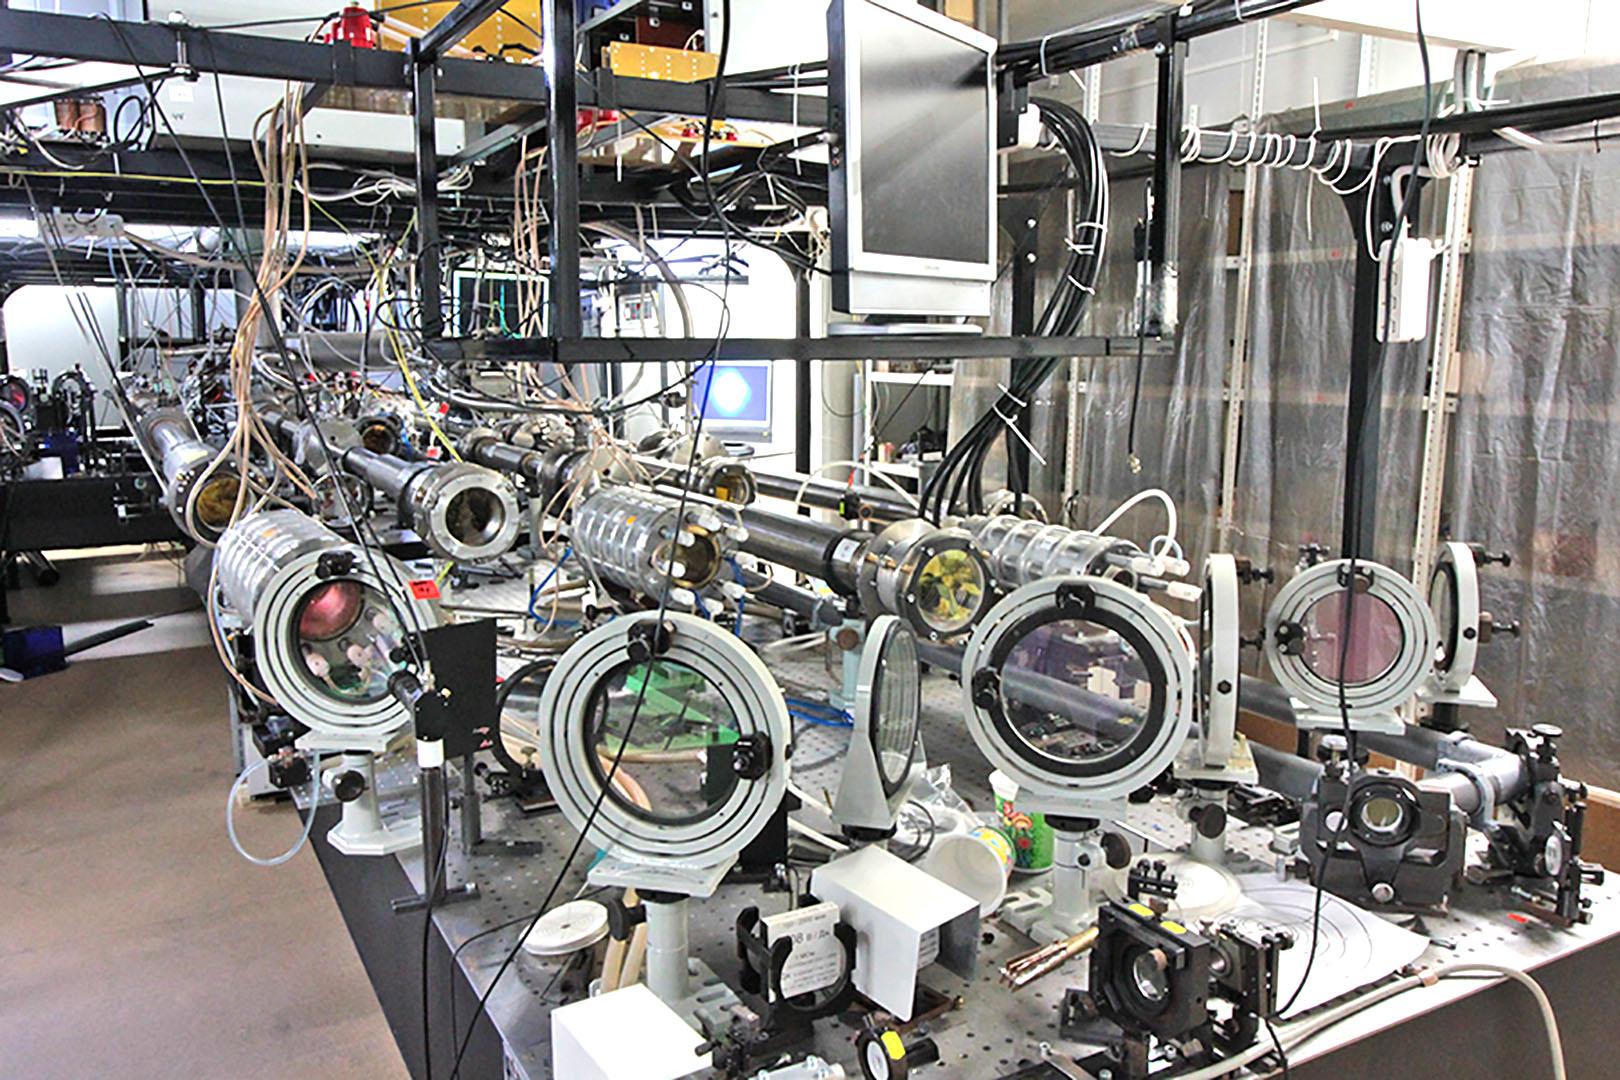 Установка PEARL (PEtawatt pARametric Laser) в ИПФ РАН. Фото А. Шайкина